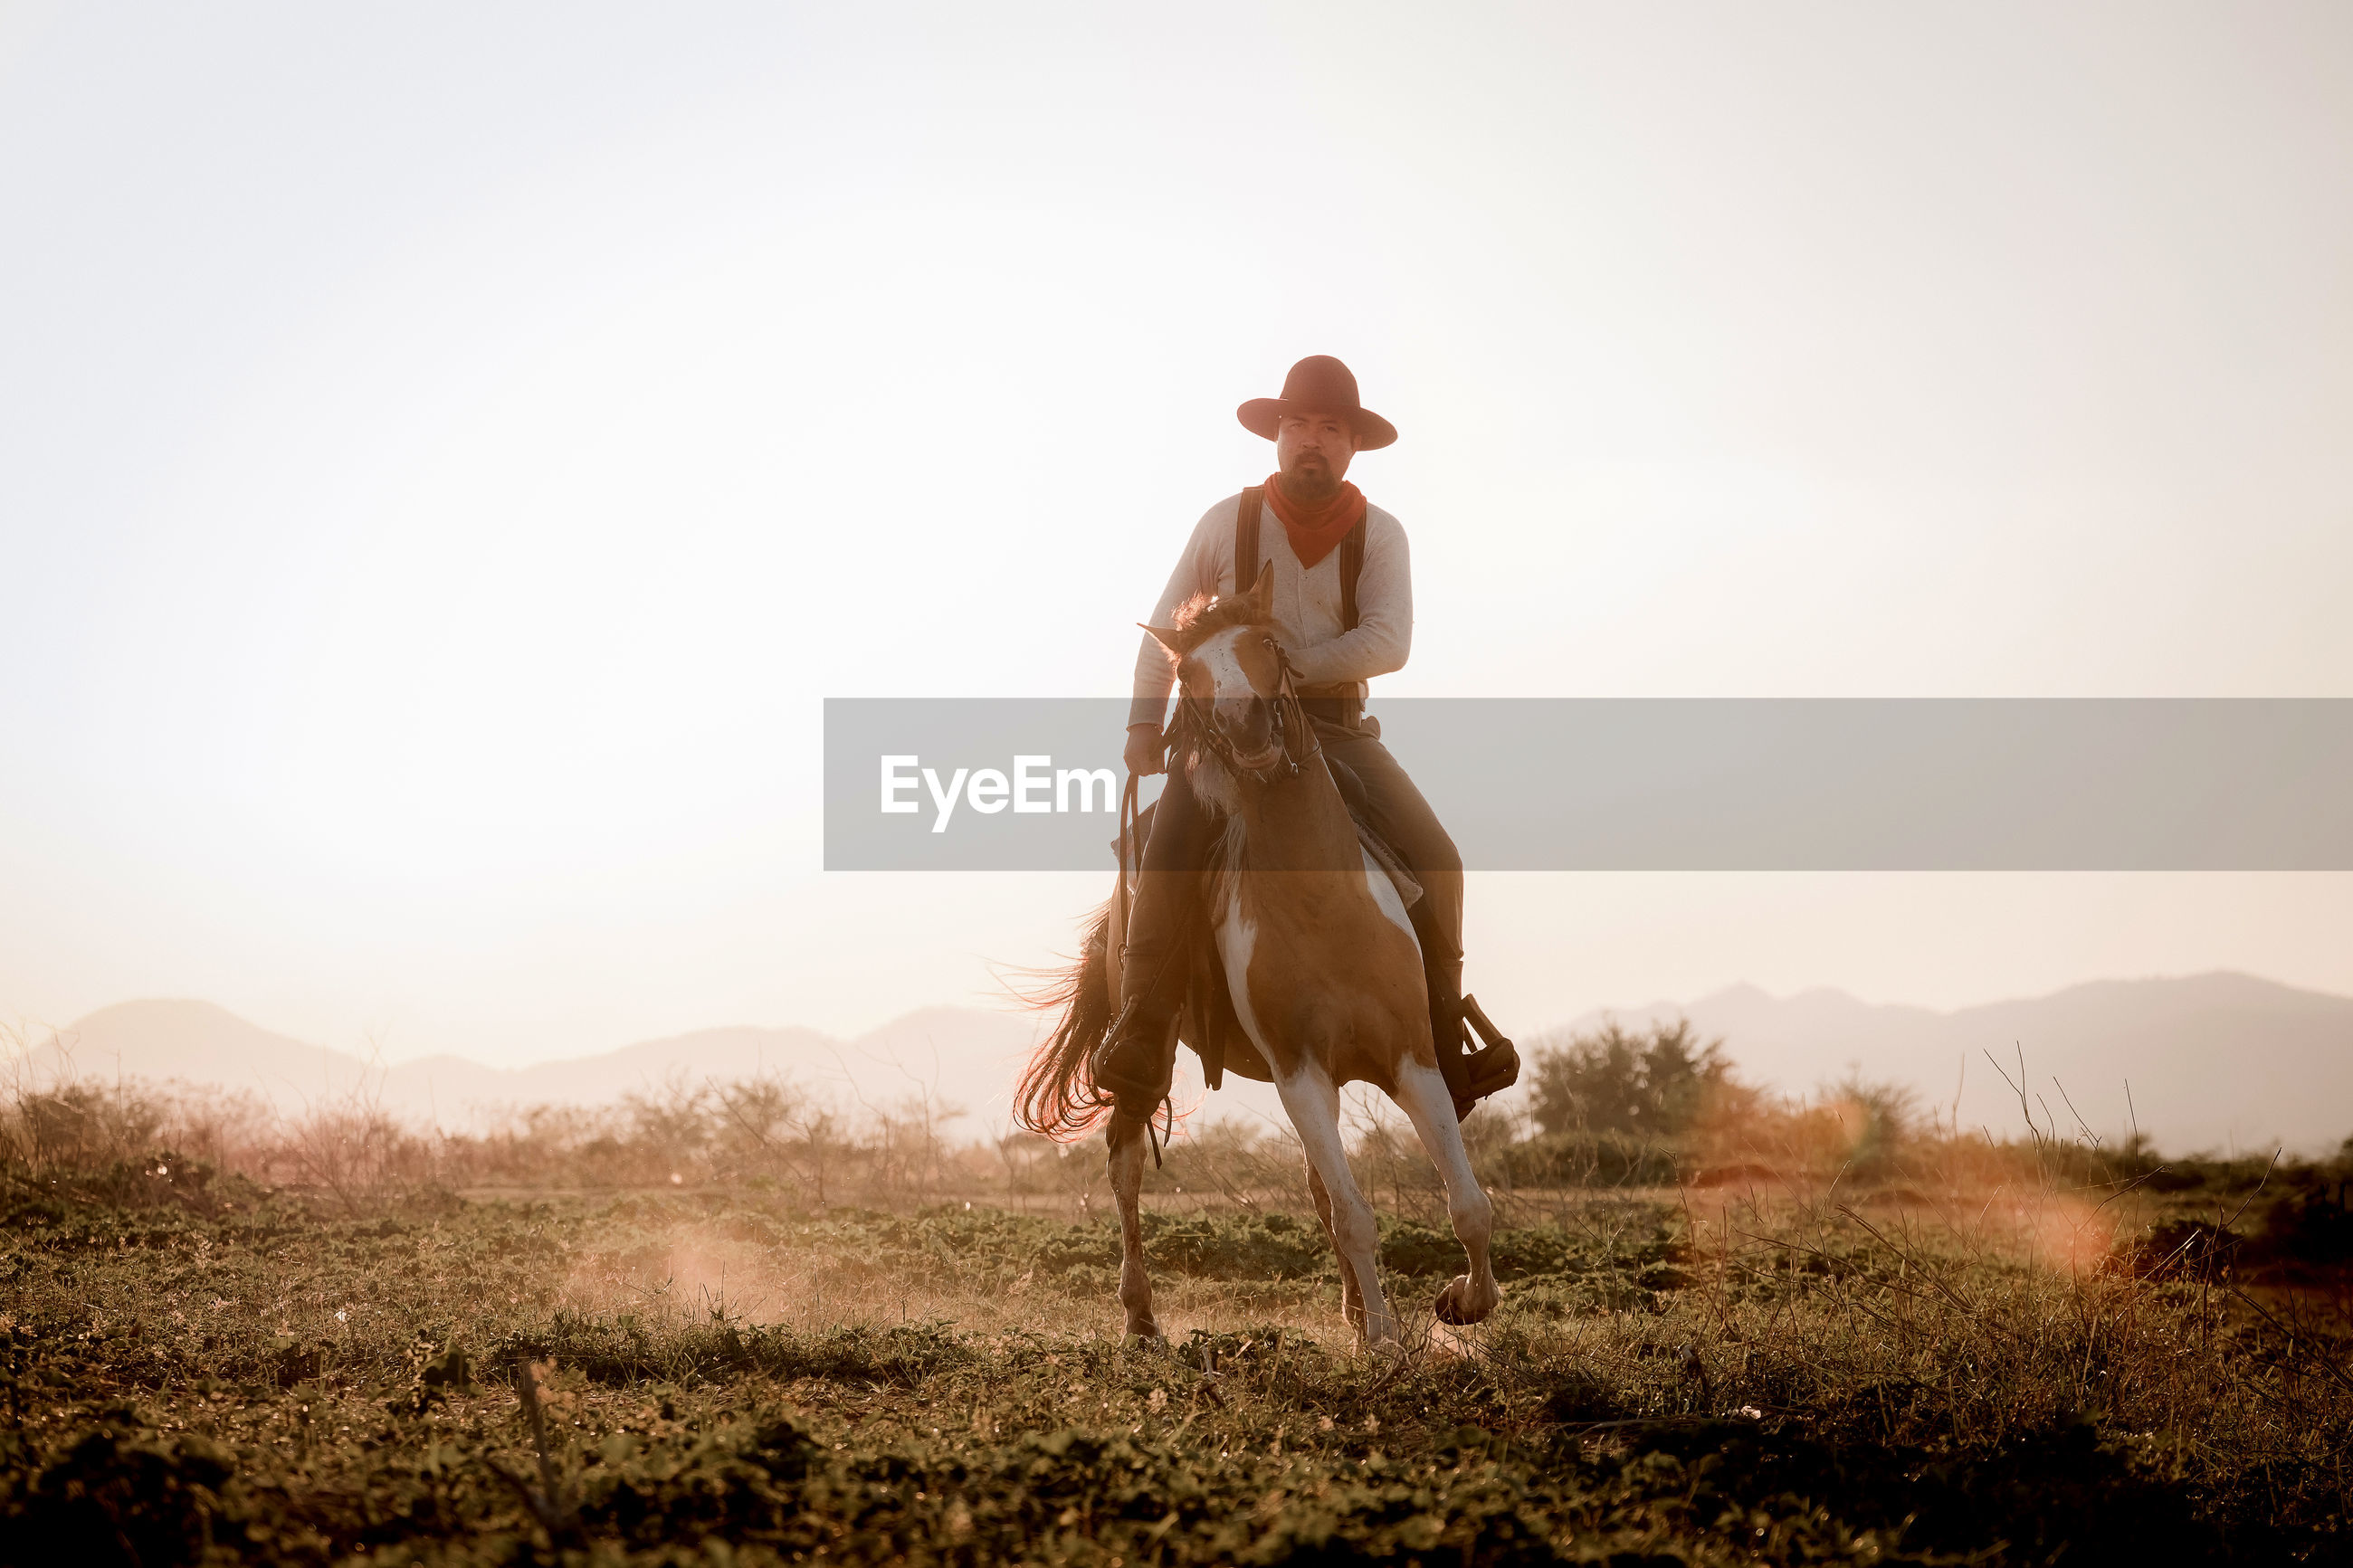 Silhouette cowboy riding a horse carrying a gun under beautiful sunset